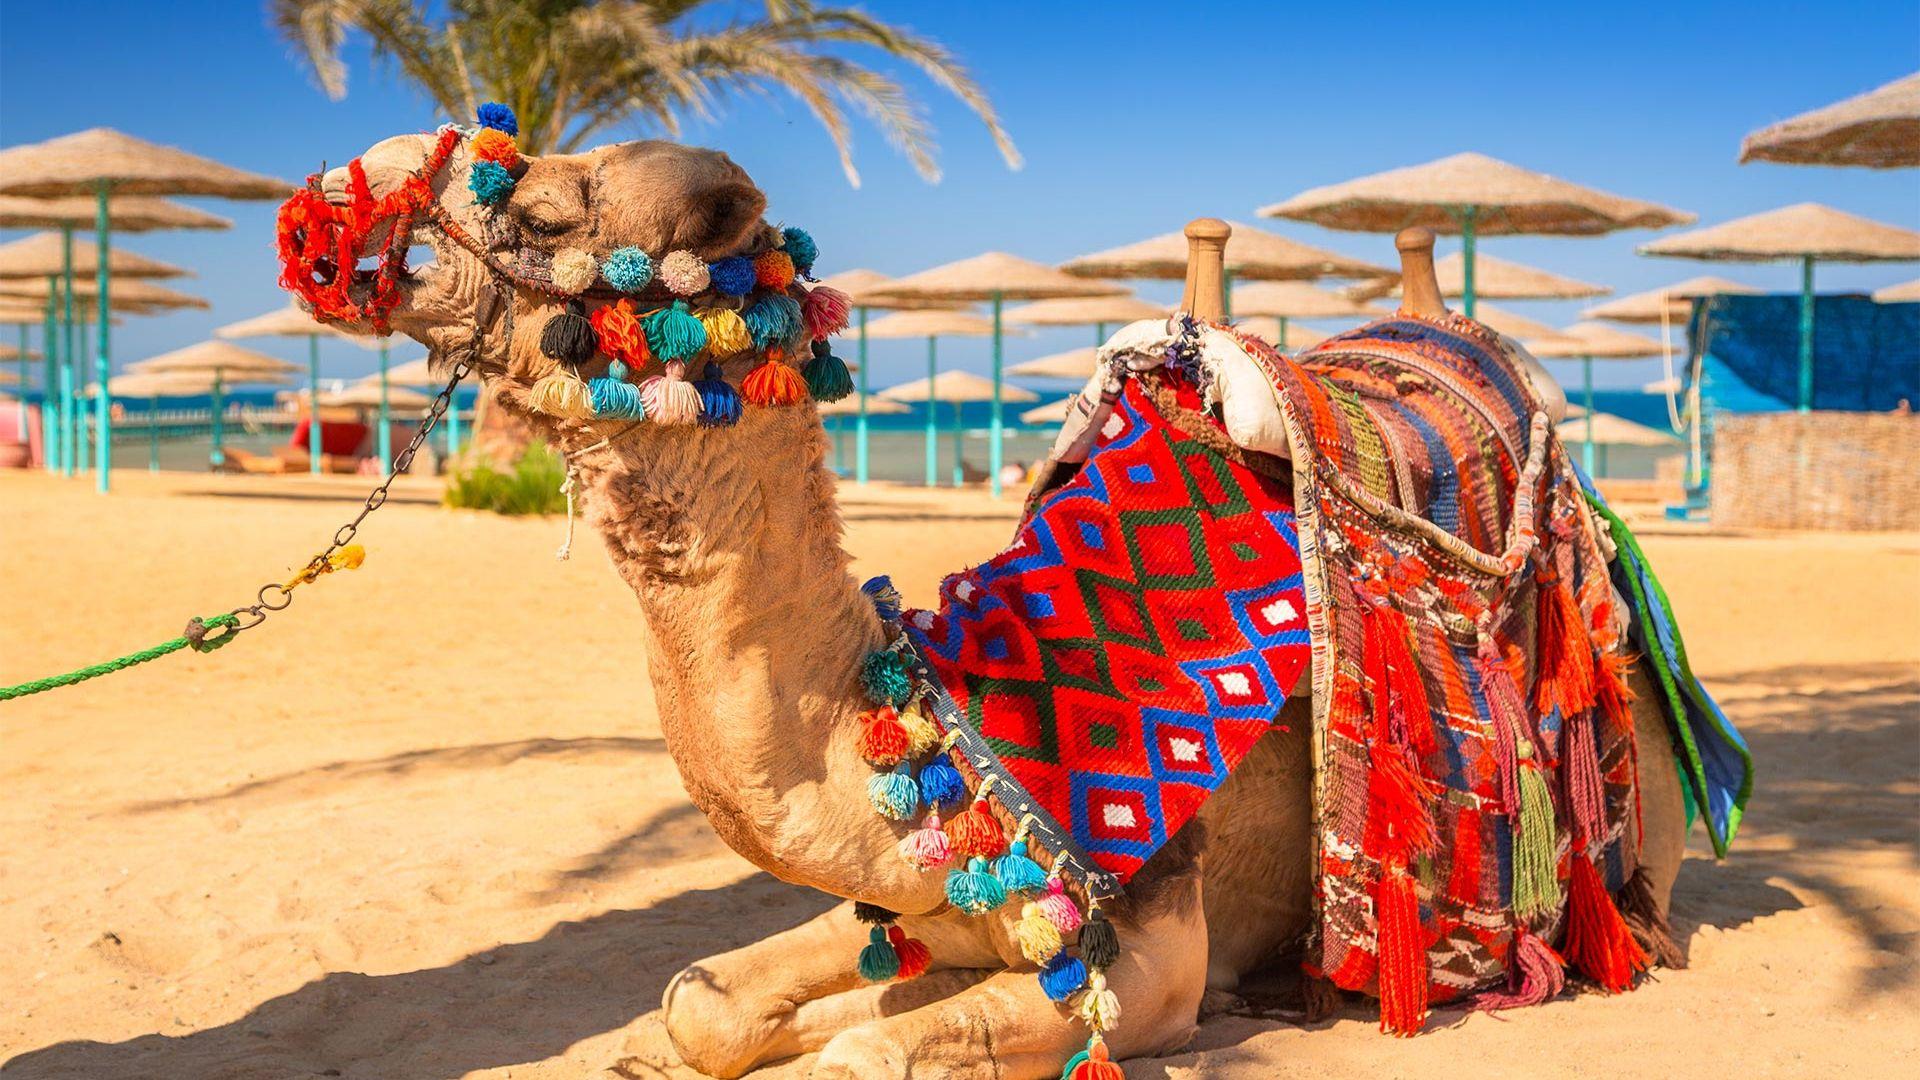 Revelion 2022 - Sejur plaja Hurghada, Egipt, 8 zile - zbor charter